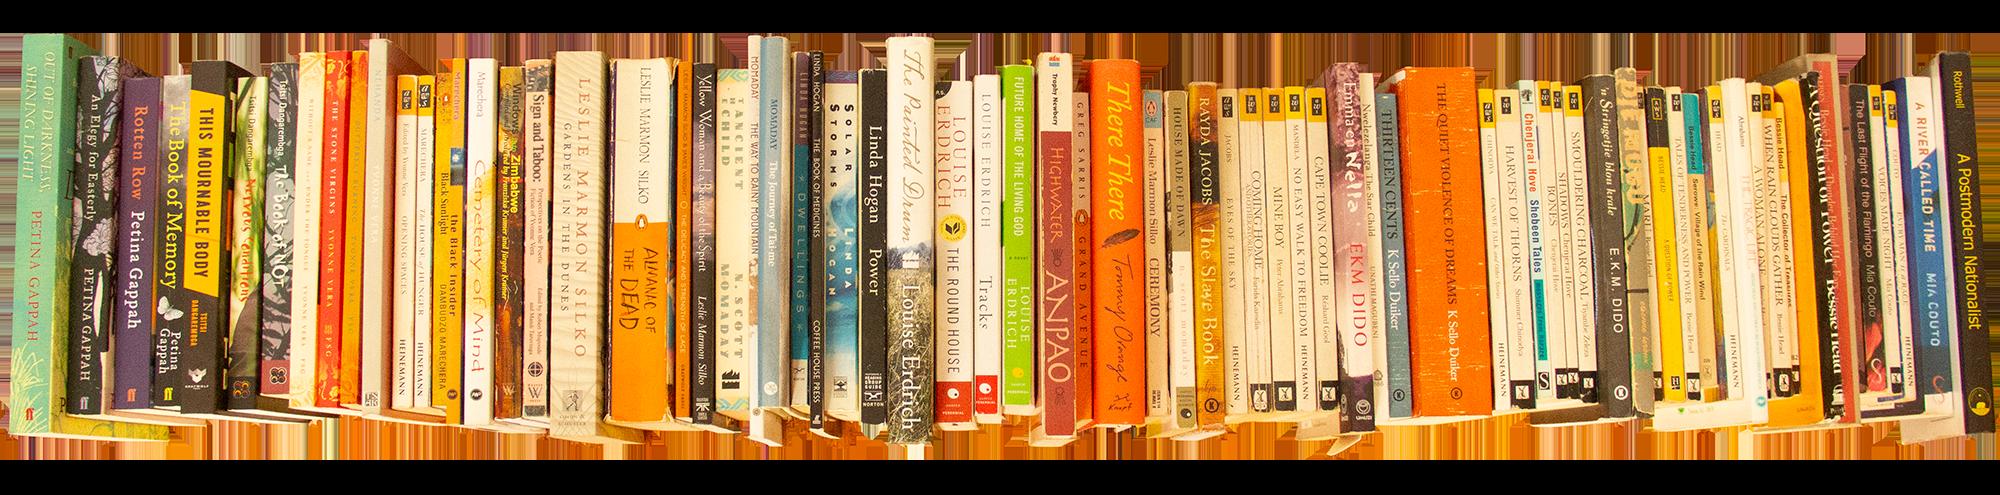 Aika Swai's Books, Cross Atlantic Themes